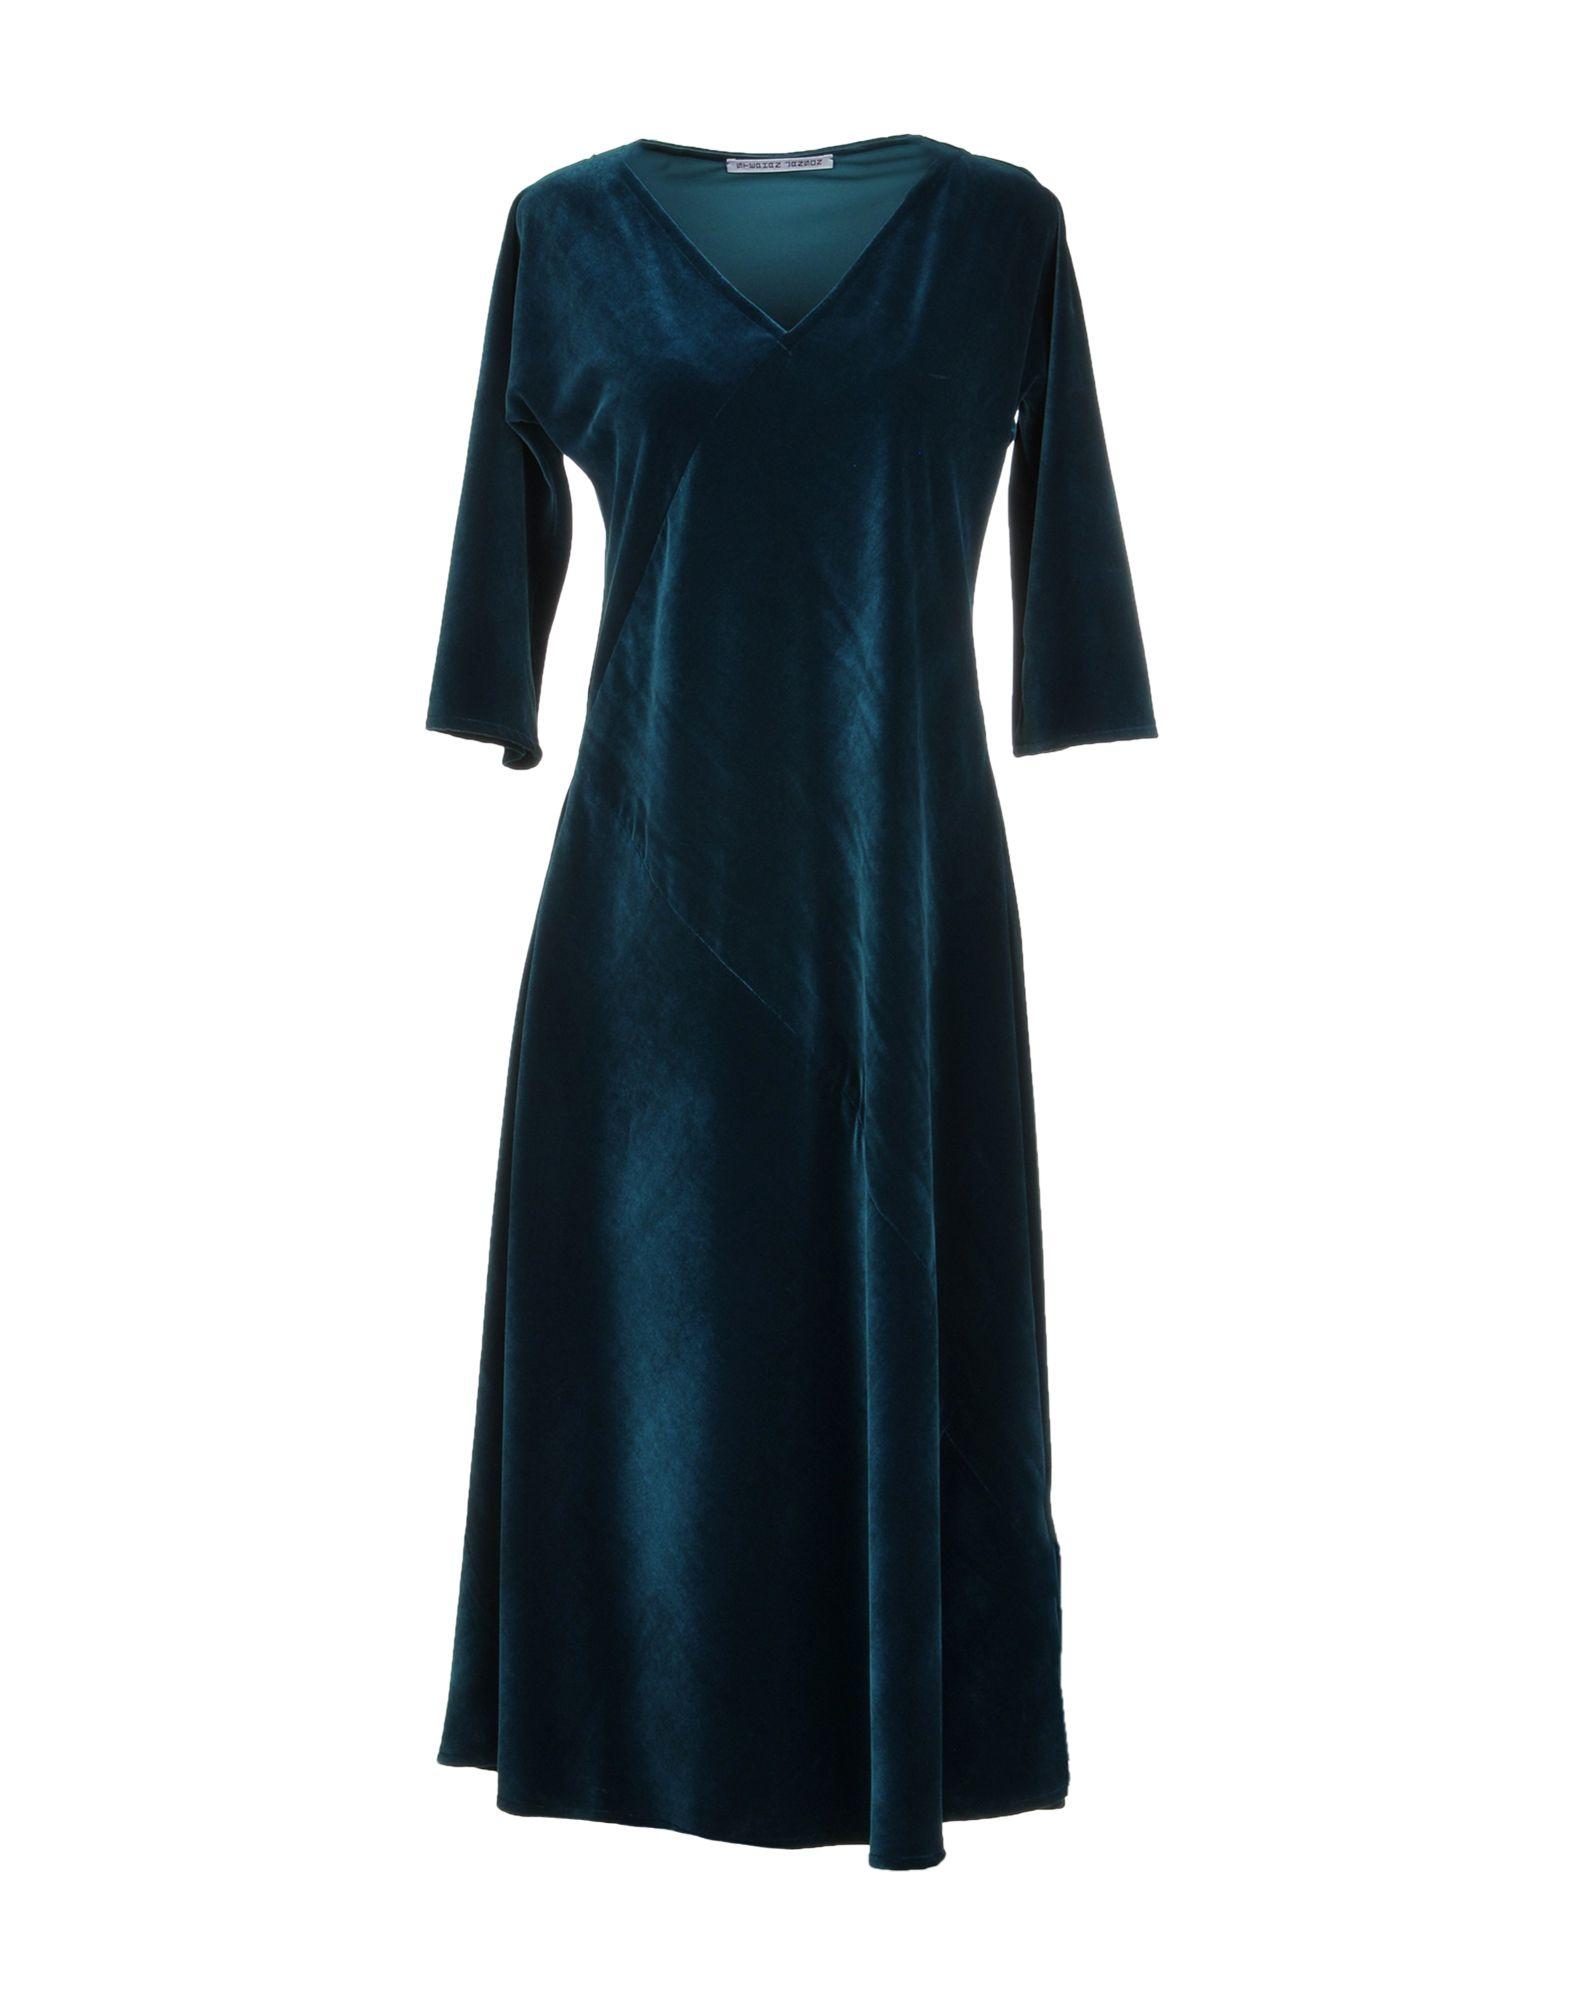 STEPHAN JANSON Knee-Length Dress in Deep Jade